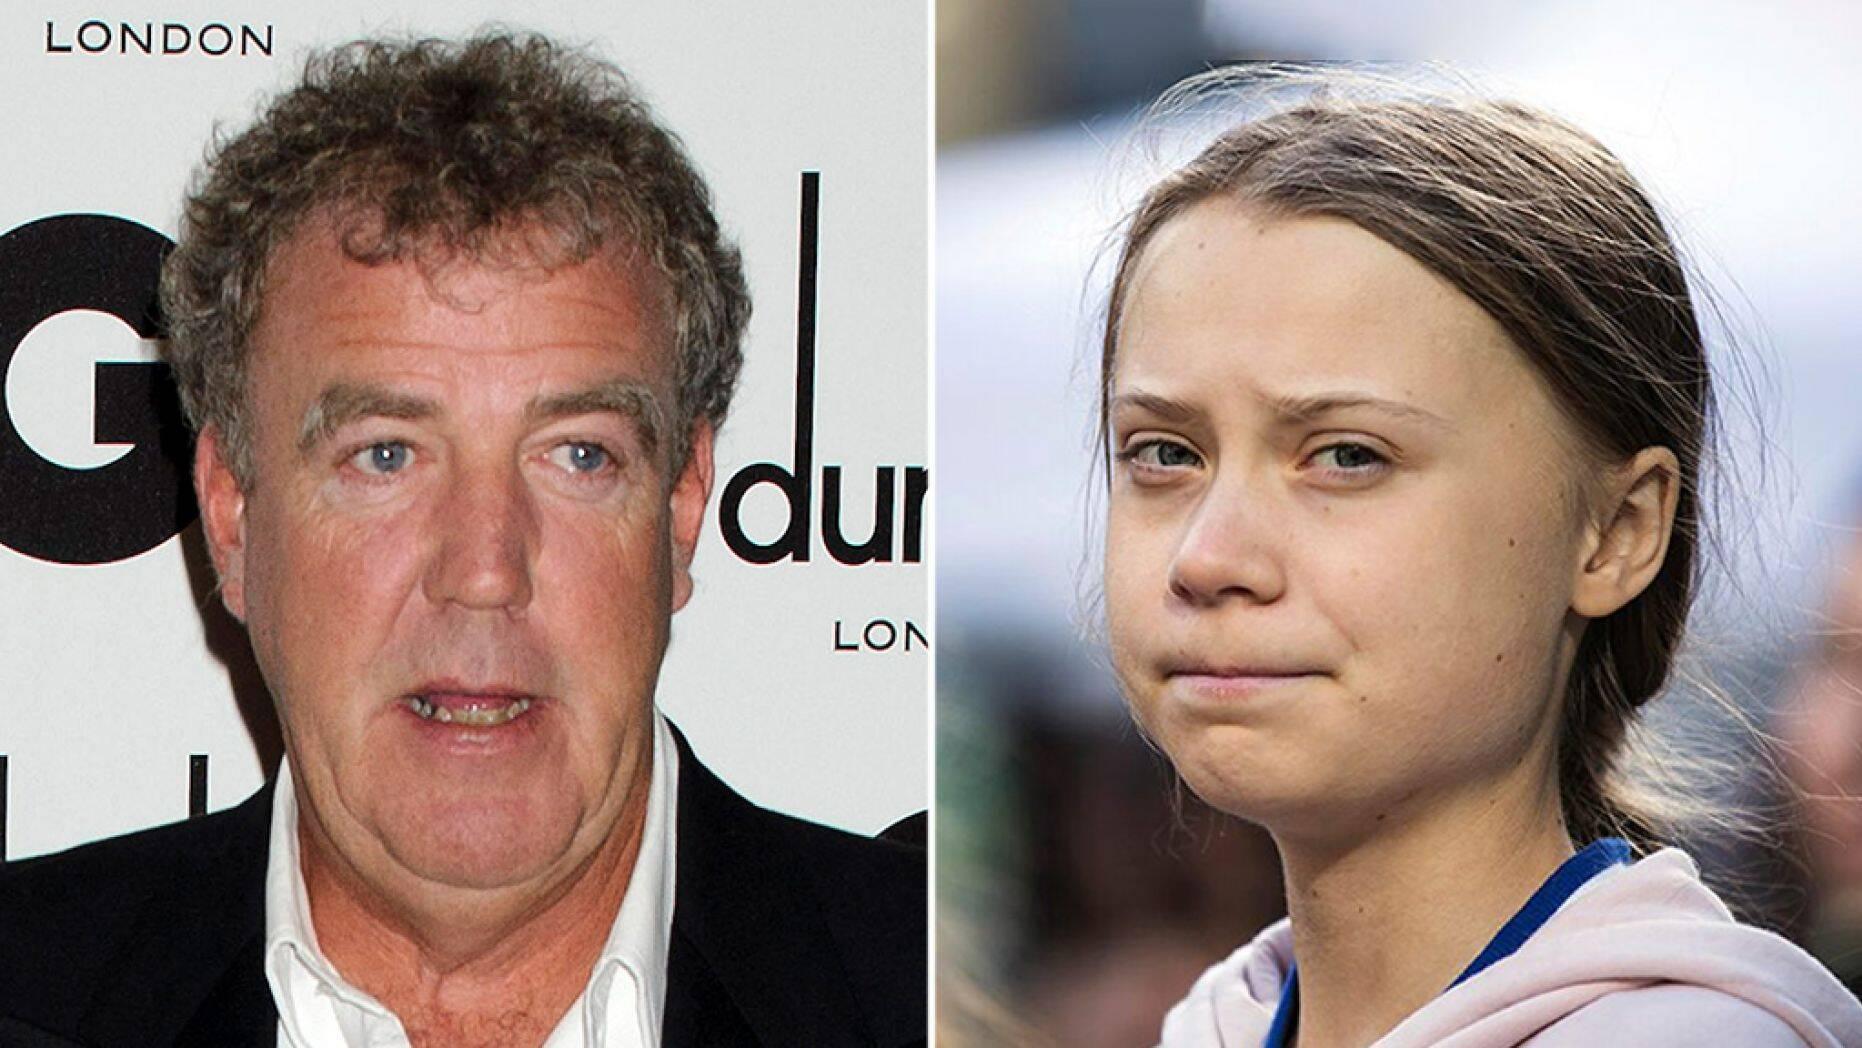 Jeremy Clarkson versus Greta Thunberg